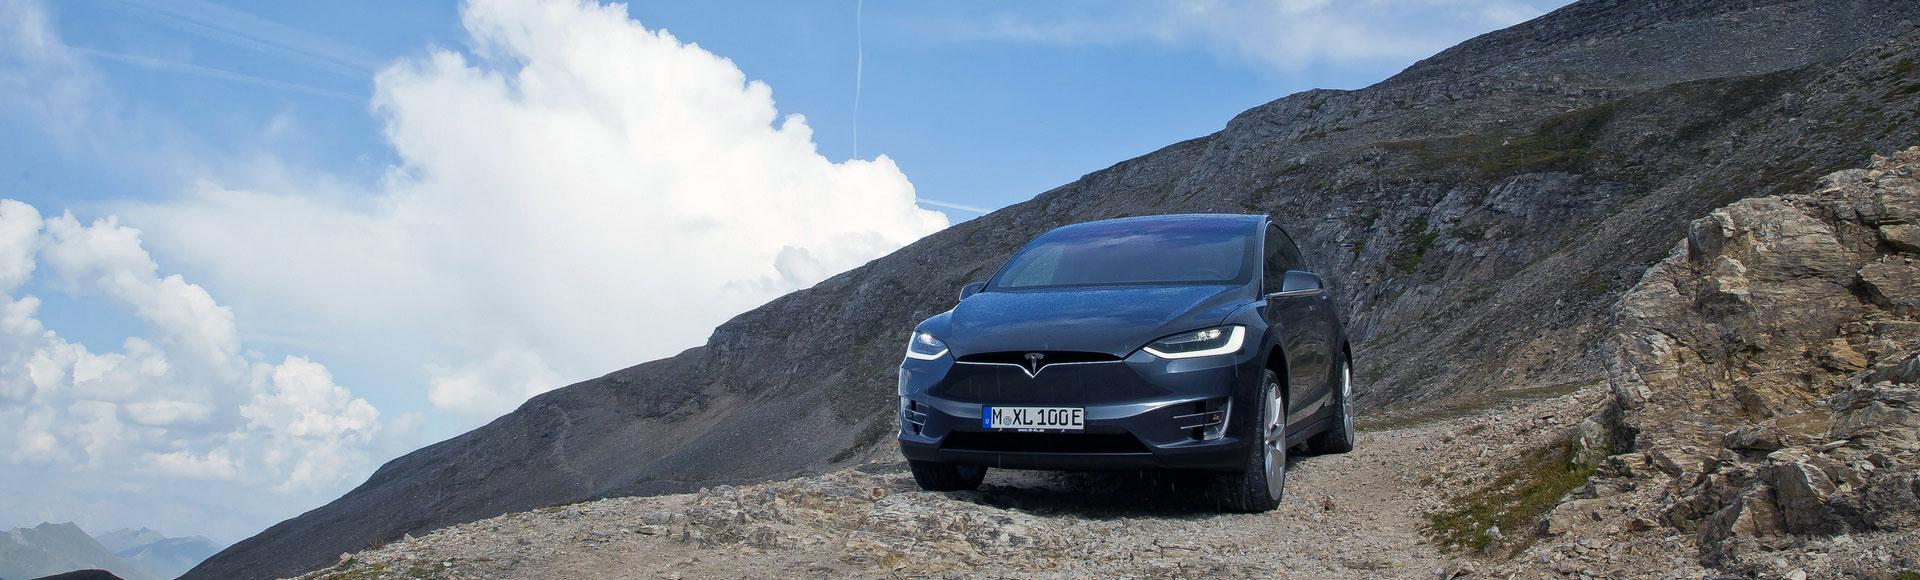 Tesla Model X 2016 332 Sommer